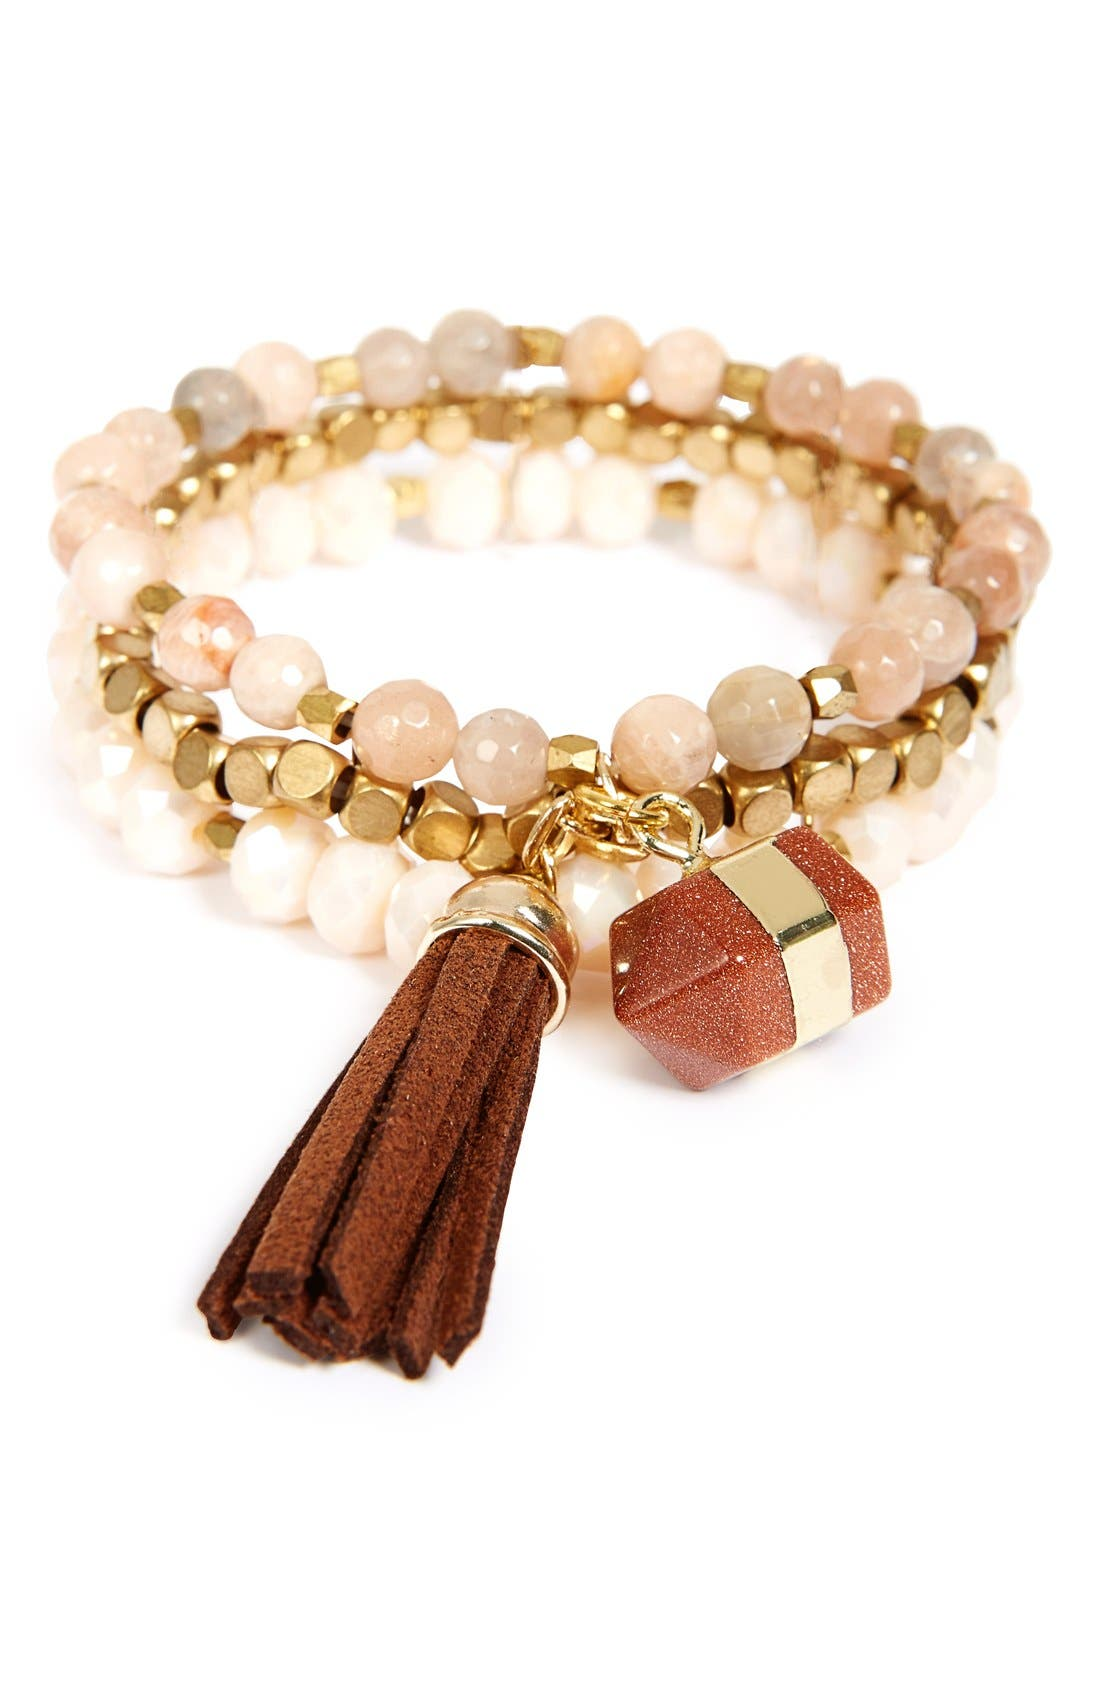 Alternate Image 1 Selected - Panacea Stone & Bead Multistrand Bracelet